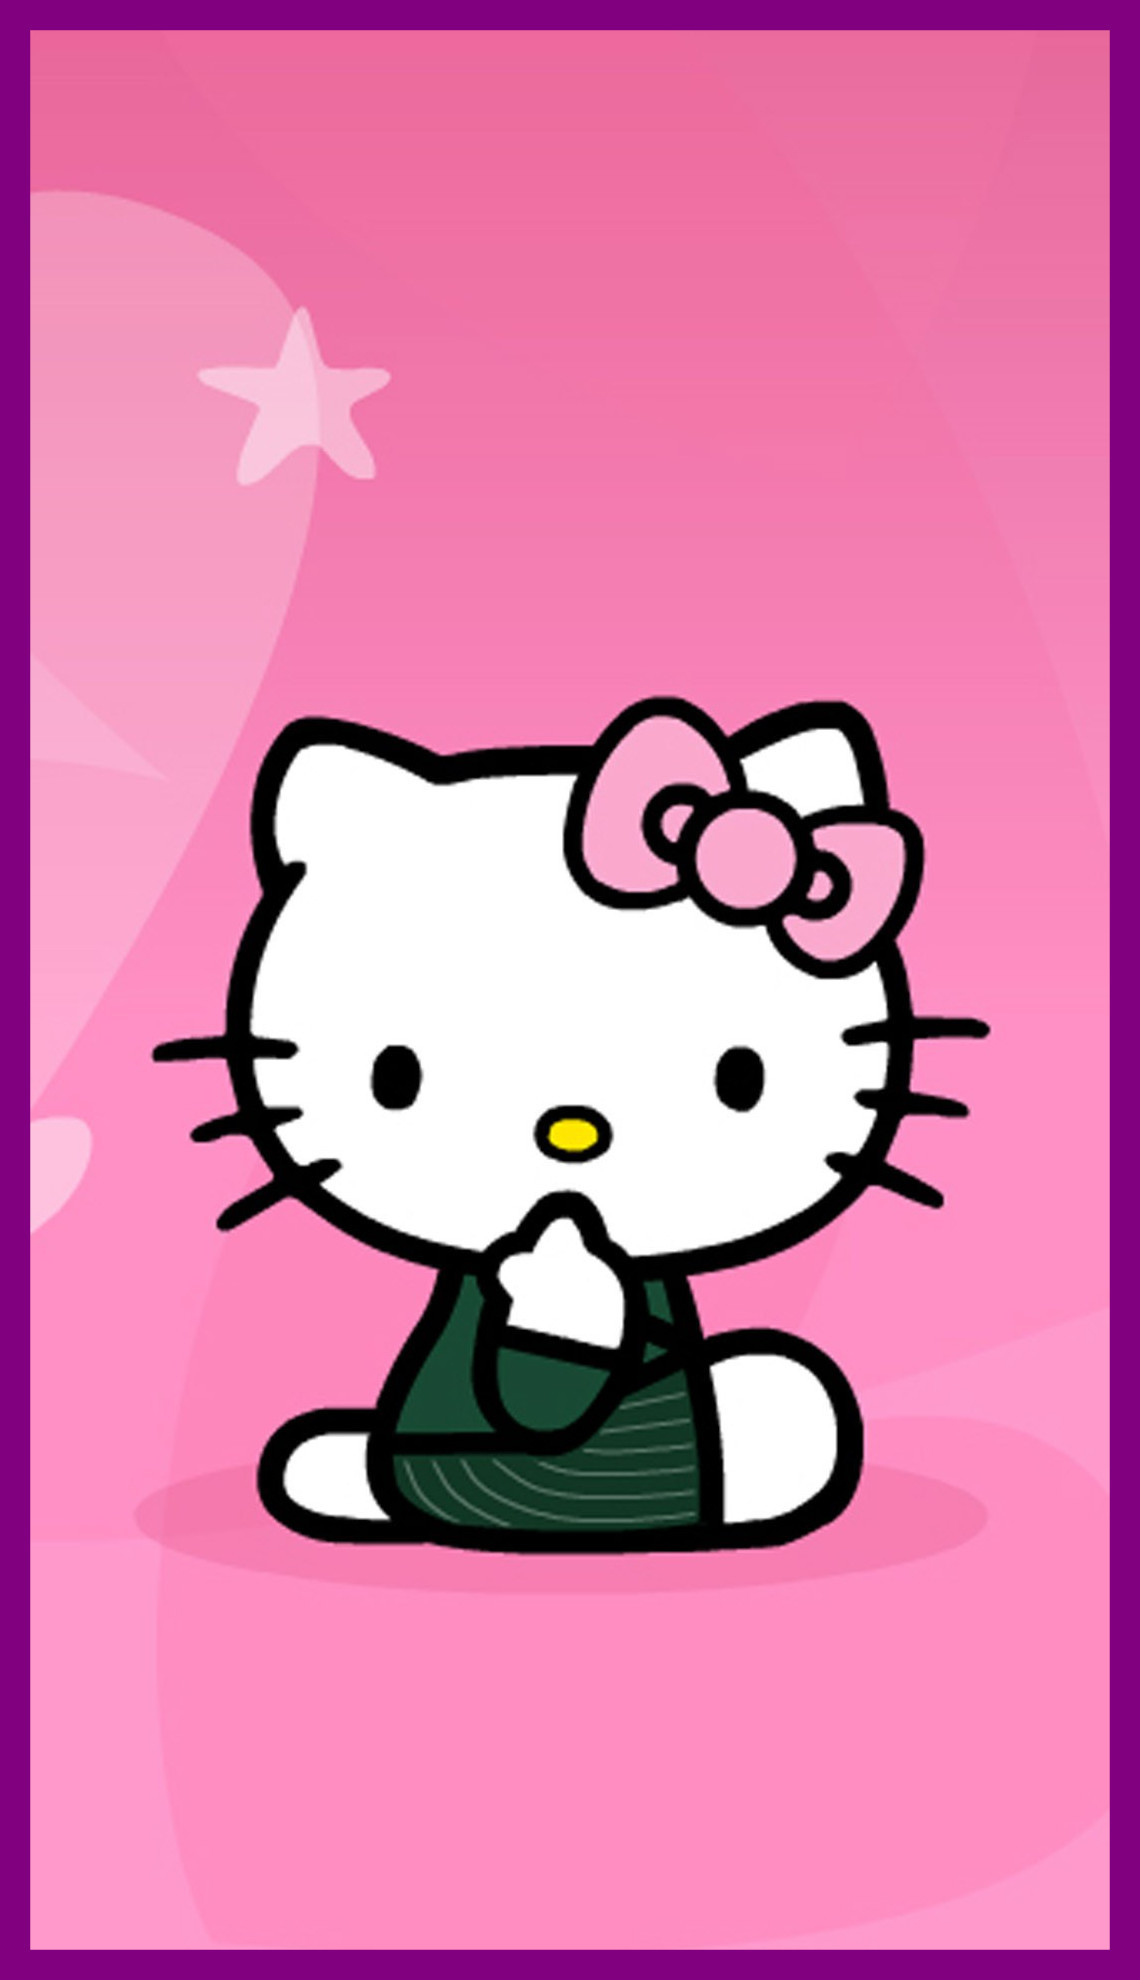 Hello Kitty Wallpaper Iphone Lenovo Vibe K5 Note Cover